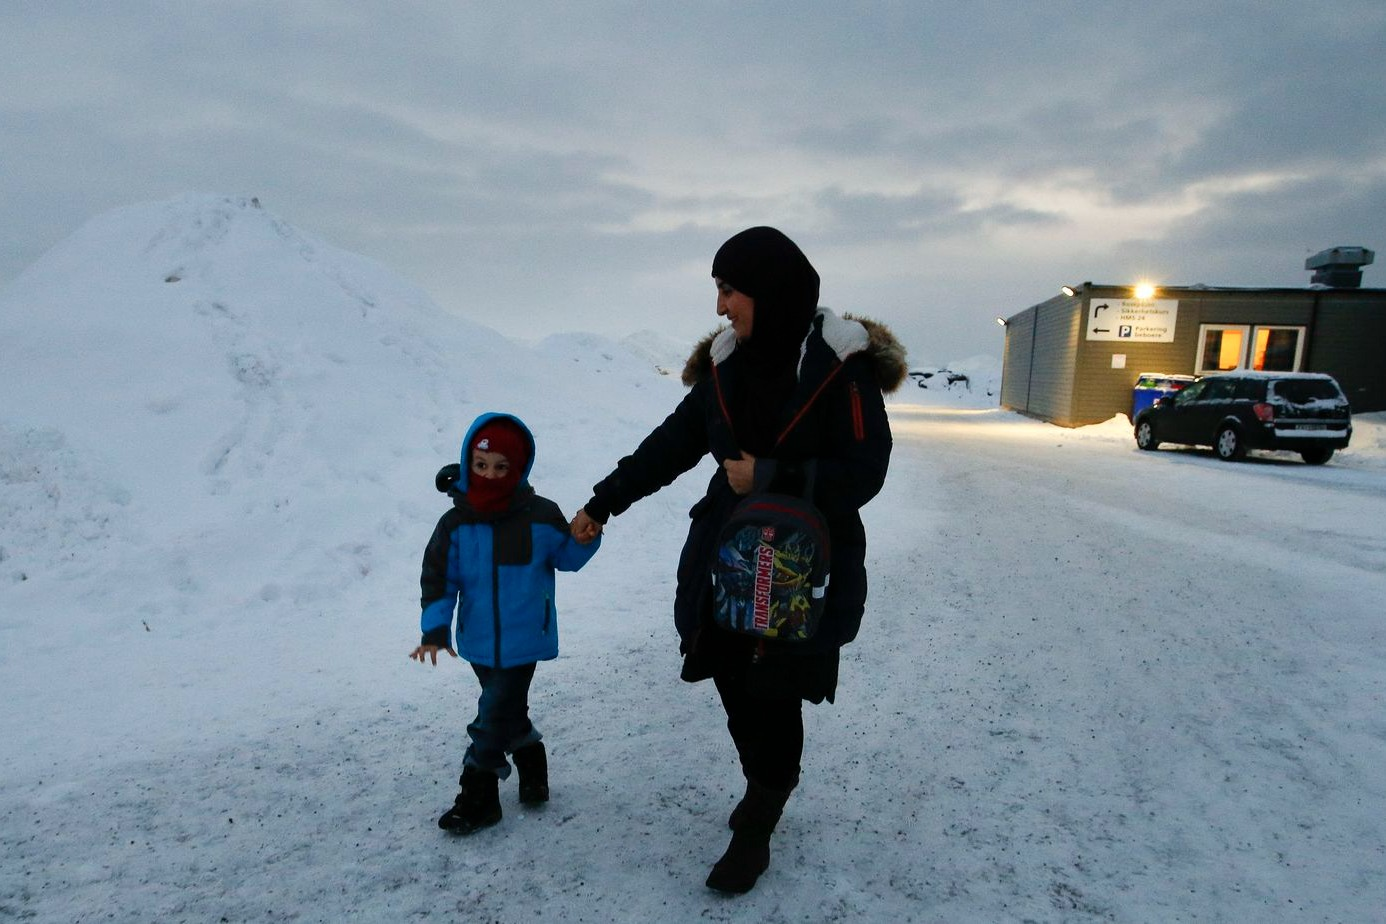 Žena migrant iz Jemena tokom šetnje sa svojim sinom ispred izbegličkog kampa u Hamerfestu, na severu Norveške, 04. februar 2016. (Foto: AP Photo/Alastair Grant)